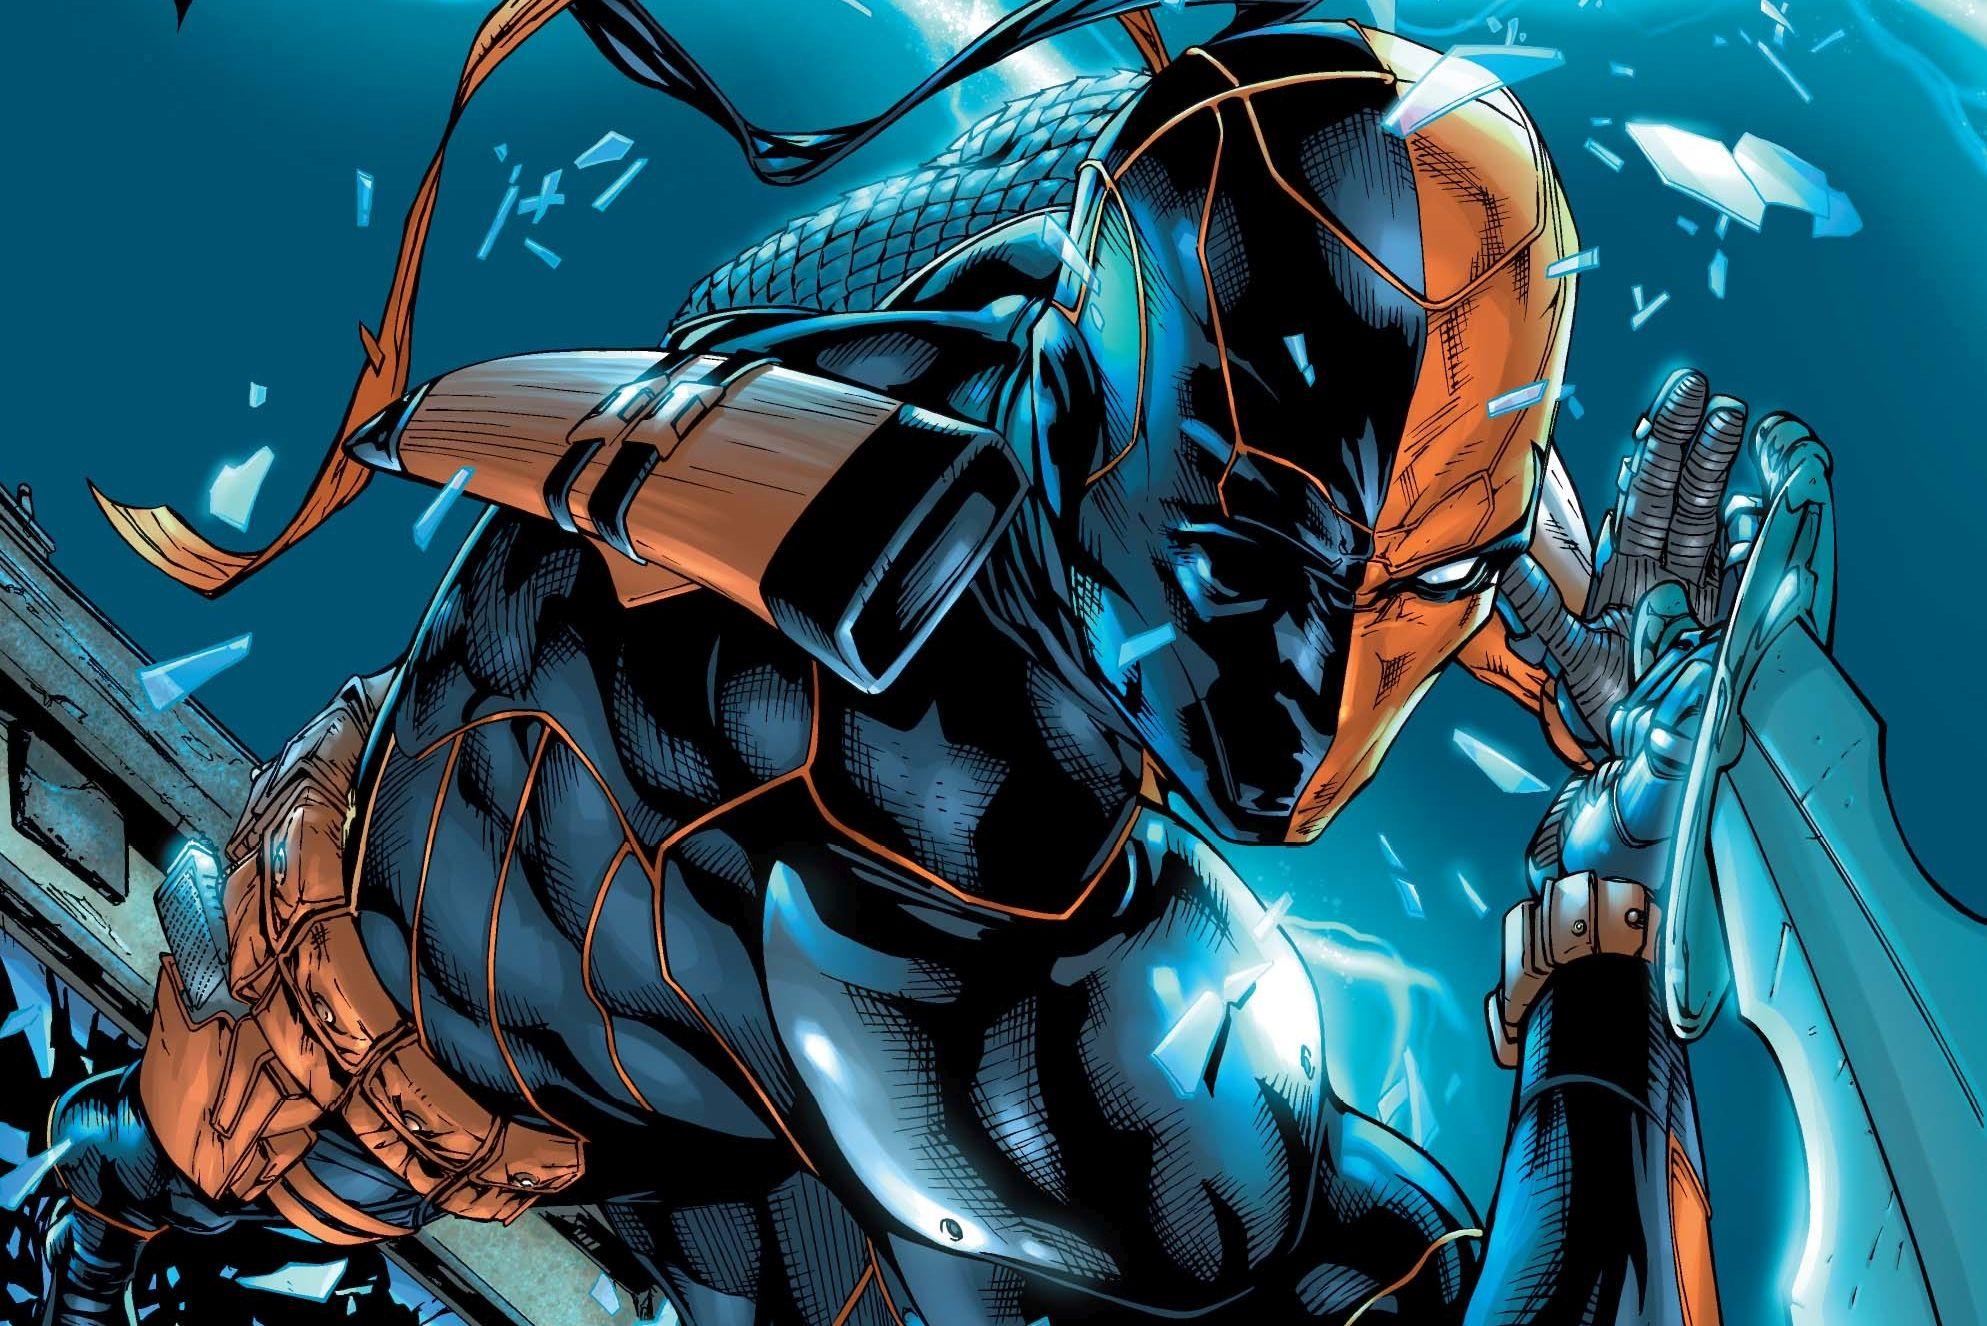 Deathstroke Dc Comics Artwork, HD Superheroes, 4k ...